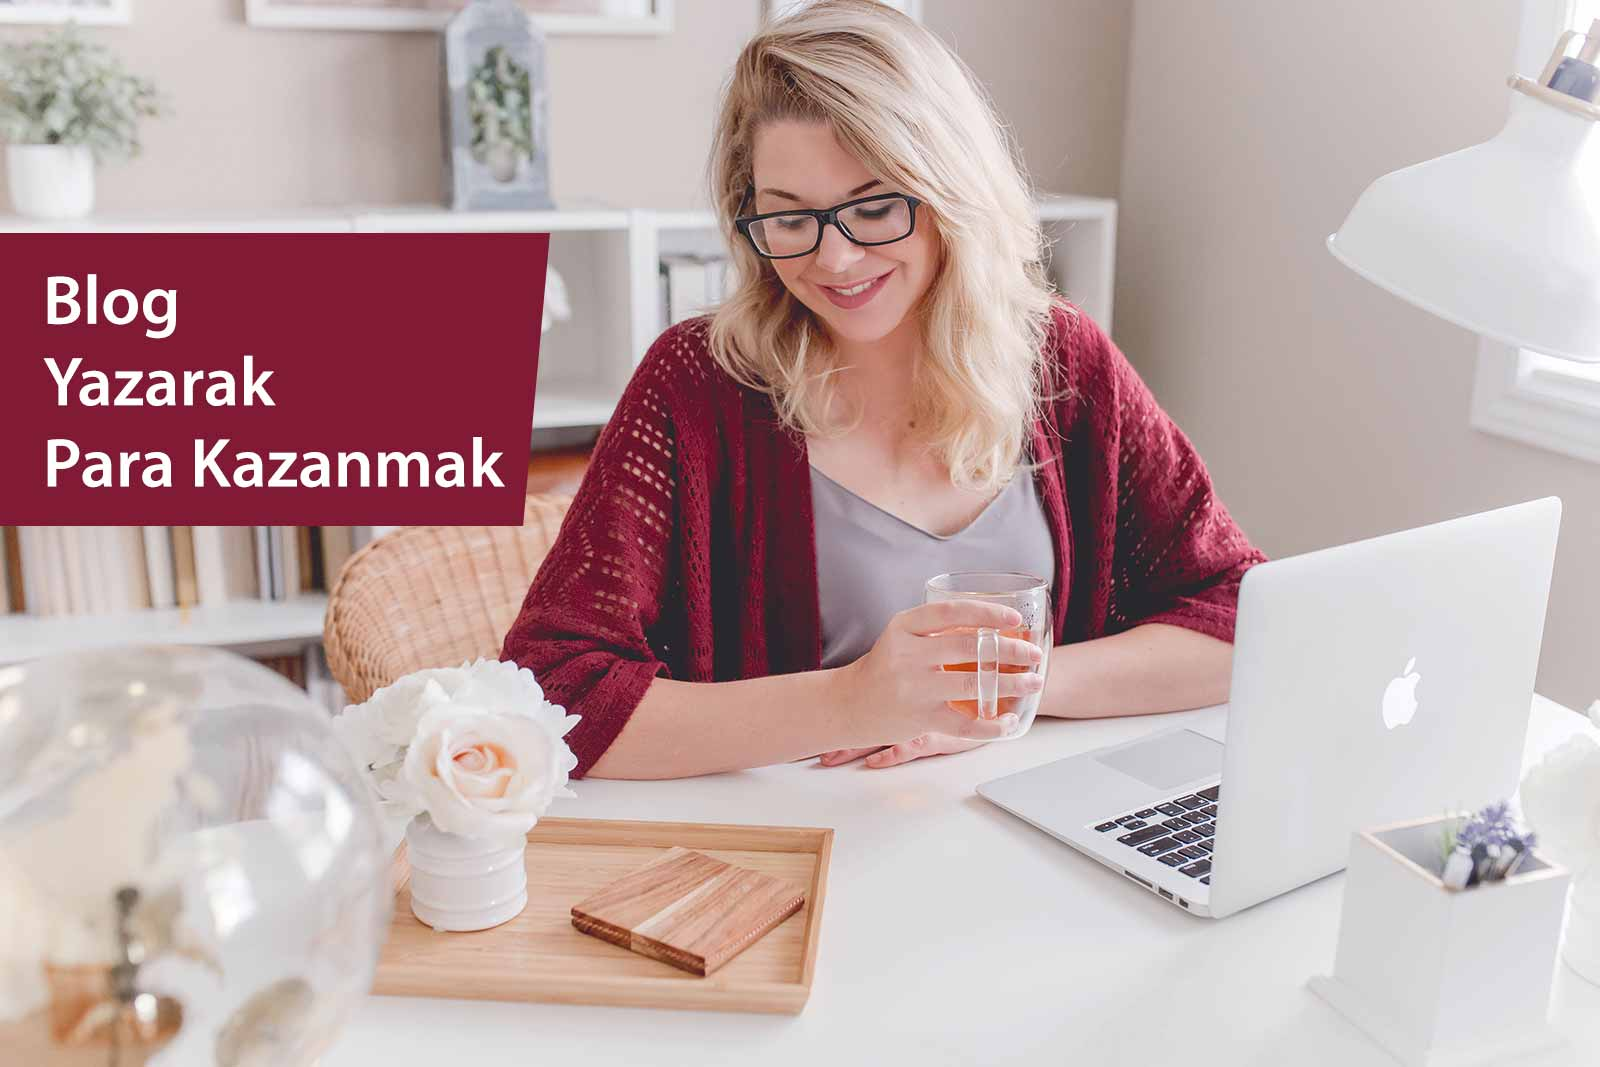 blog-yazarak-para-kazanmak